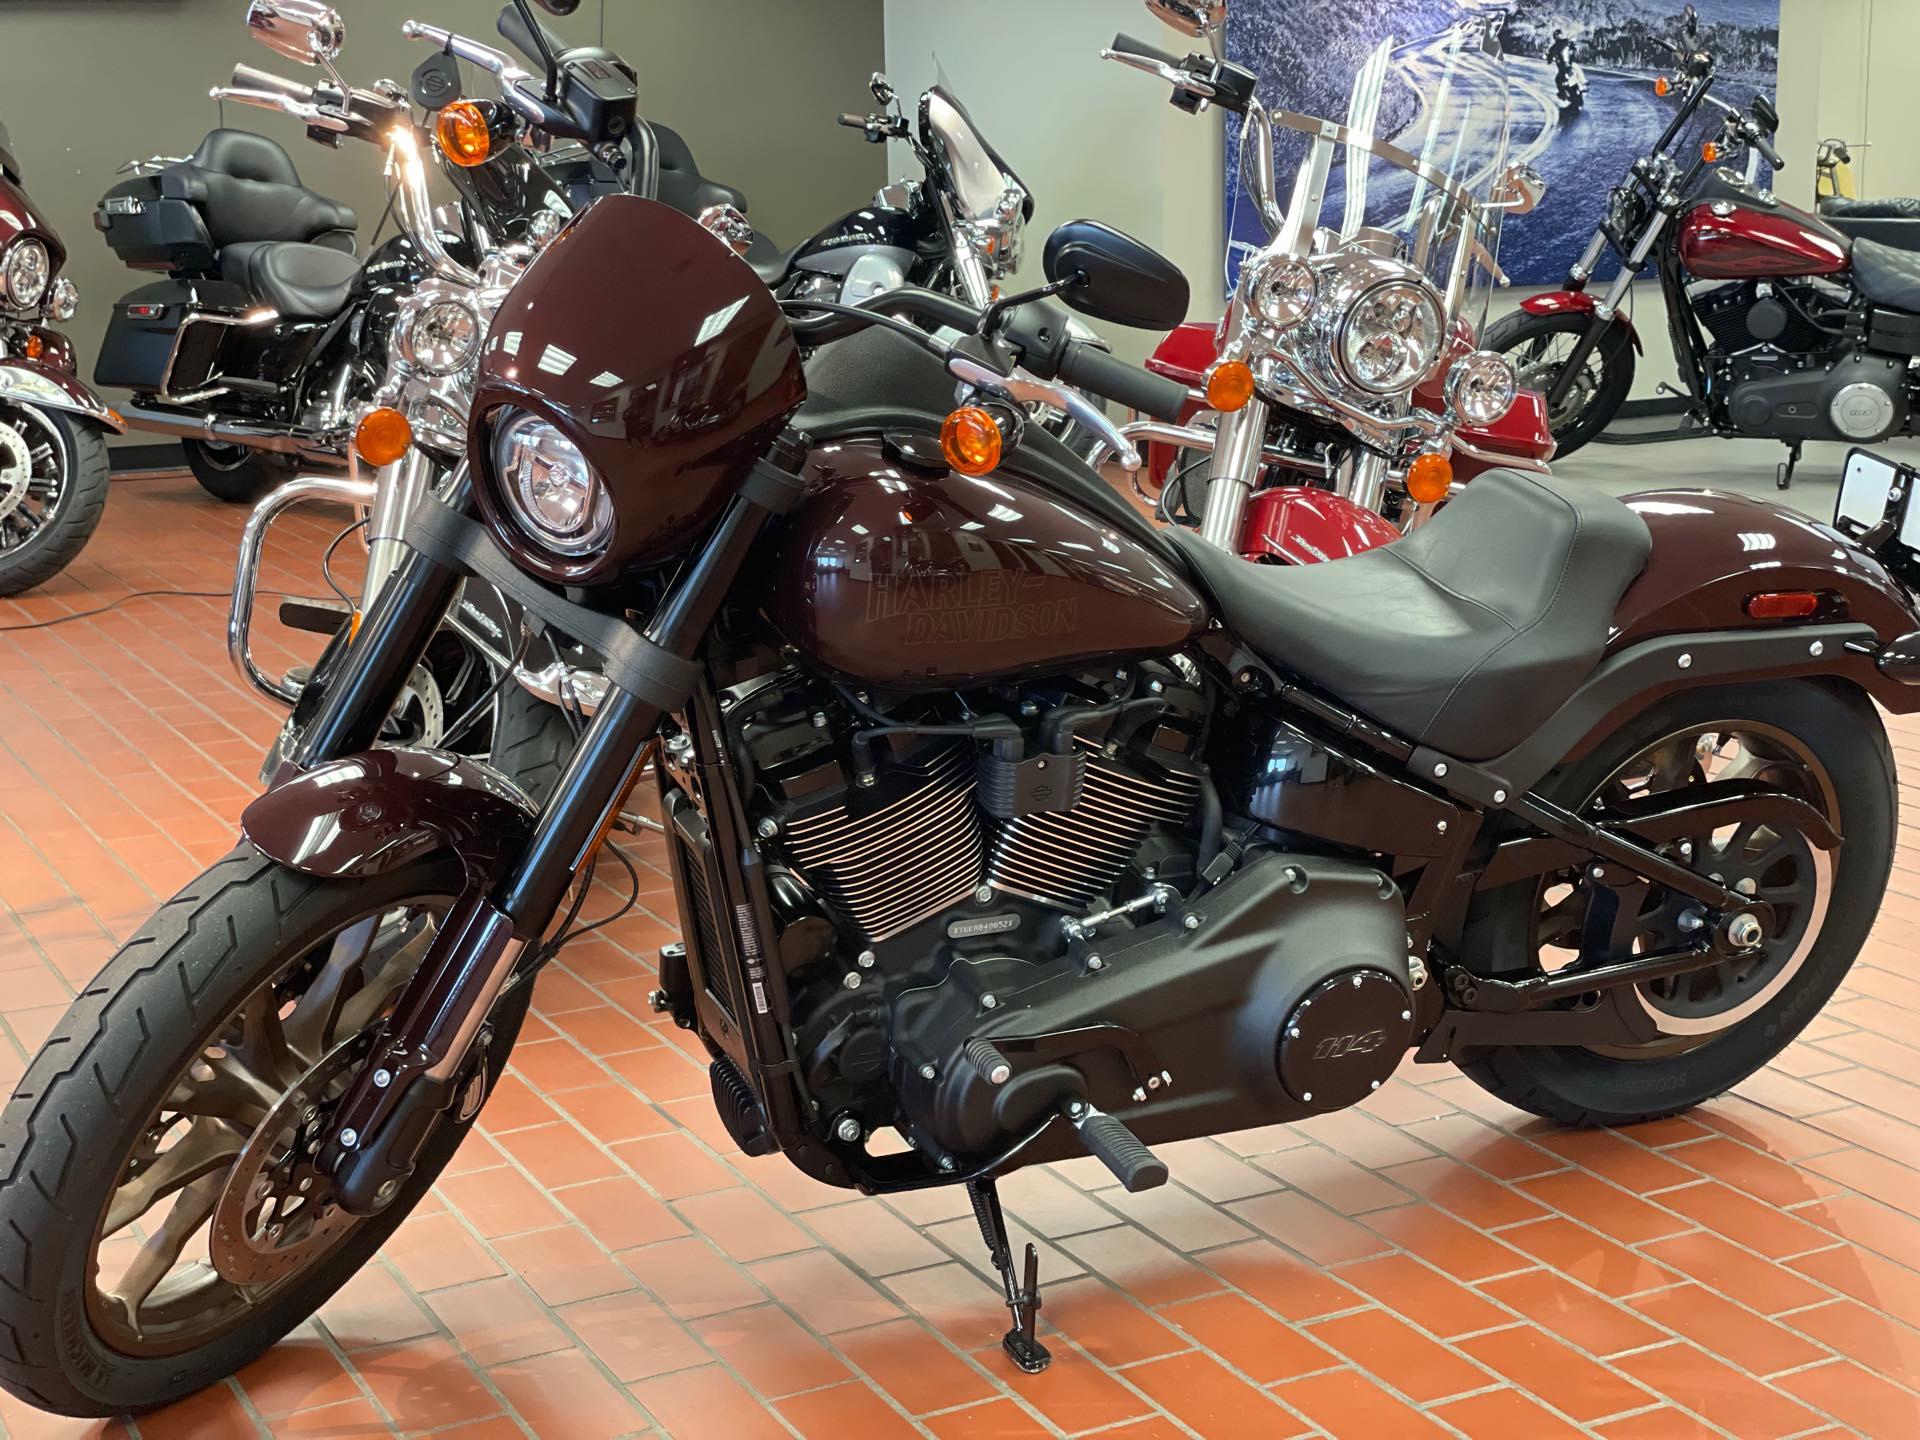 2021 Harley-Davidson Cruiser Low Rider S at Rooster's Harley Davidson